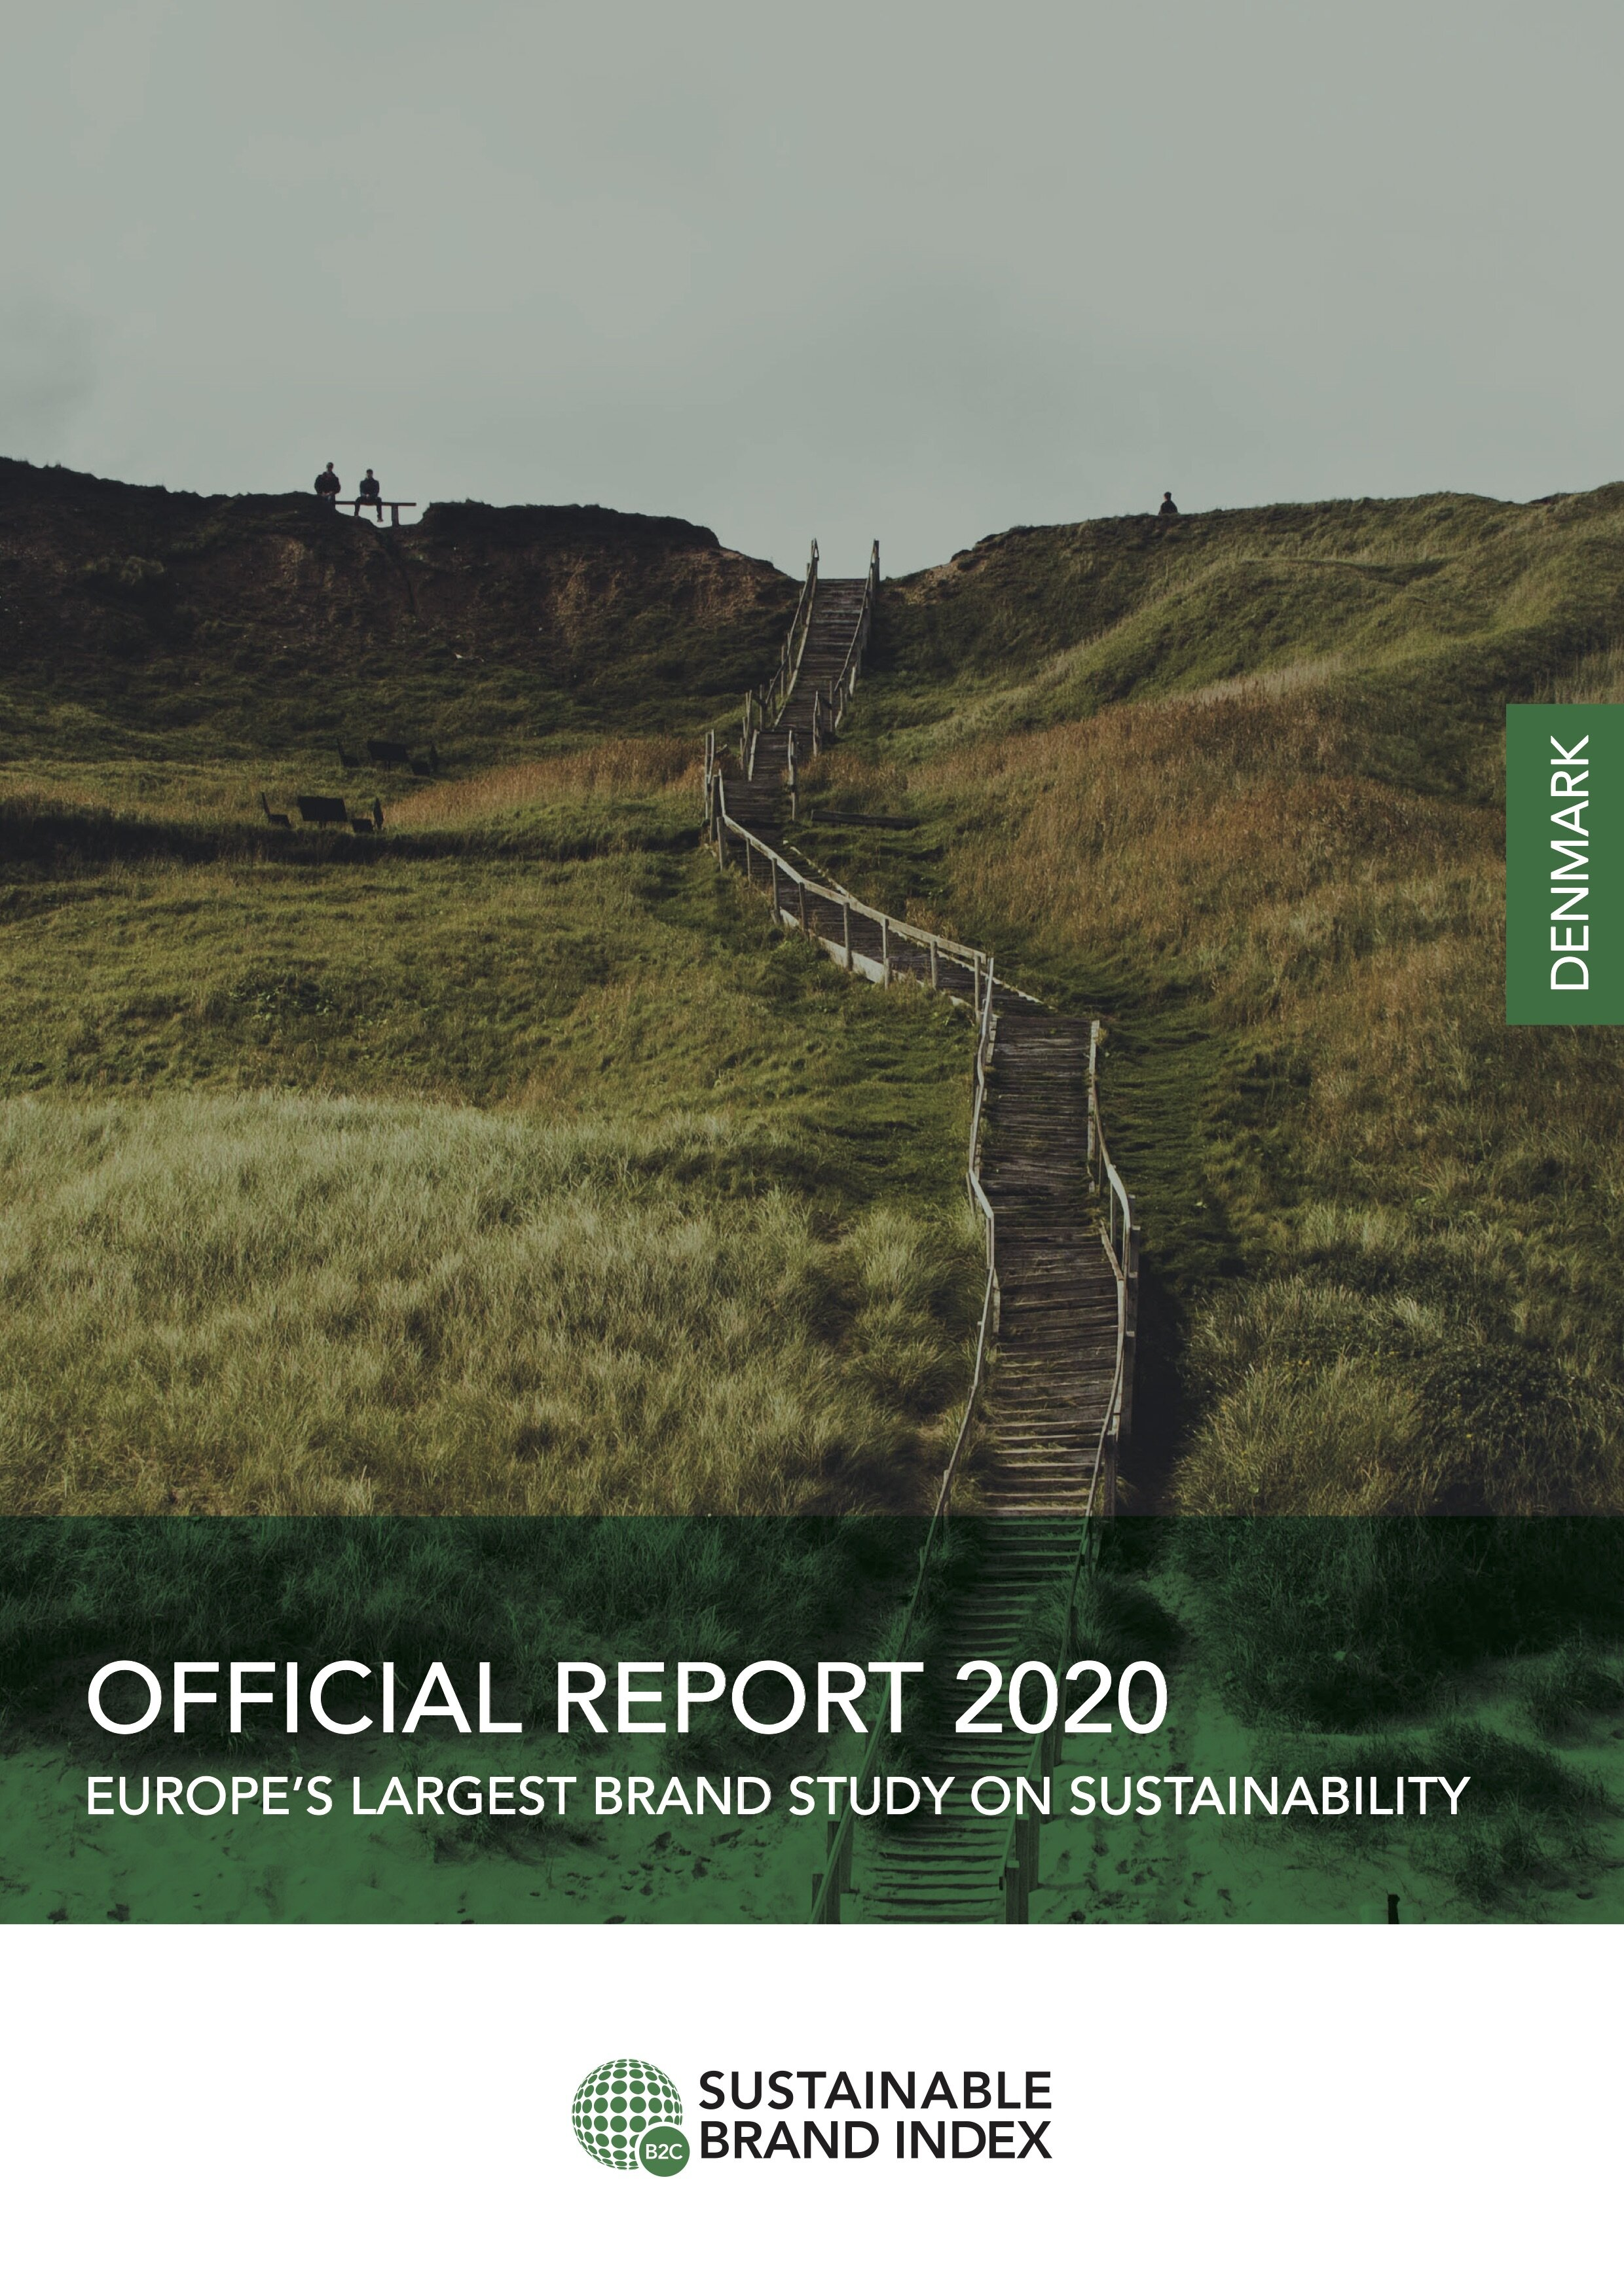 DK_Official Report_2020_High res-p1.jpg